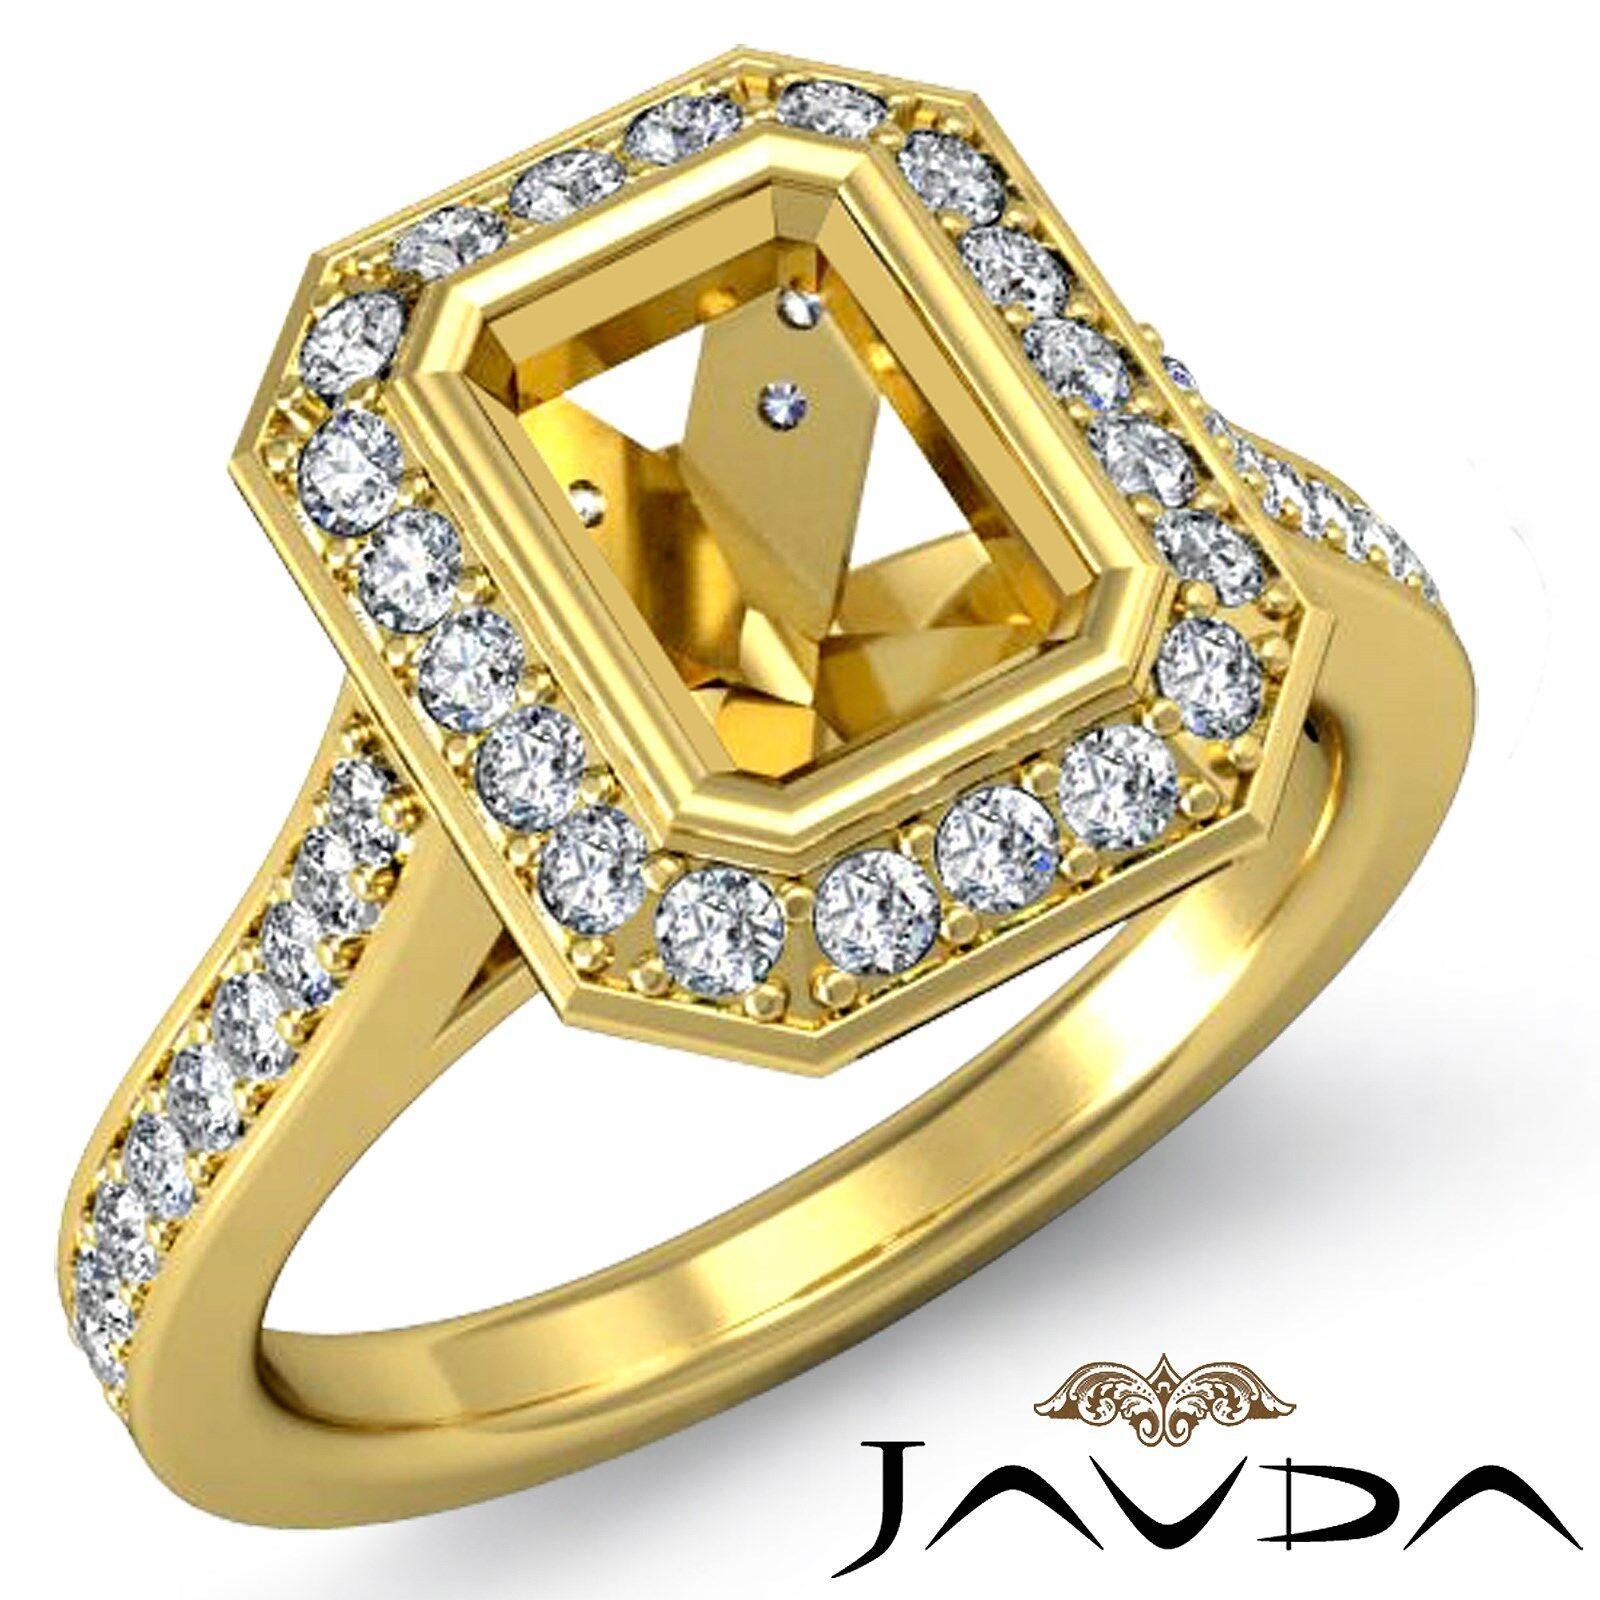 0.5Ct Diamond Engagement Ring Emerald Semi Mount Halo Setting 18k Yellow gold